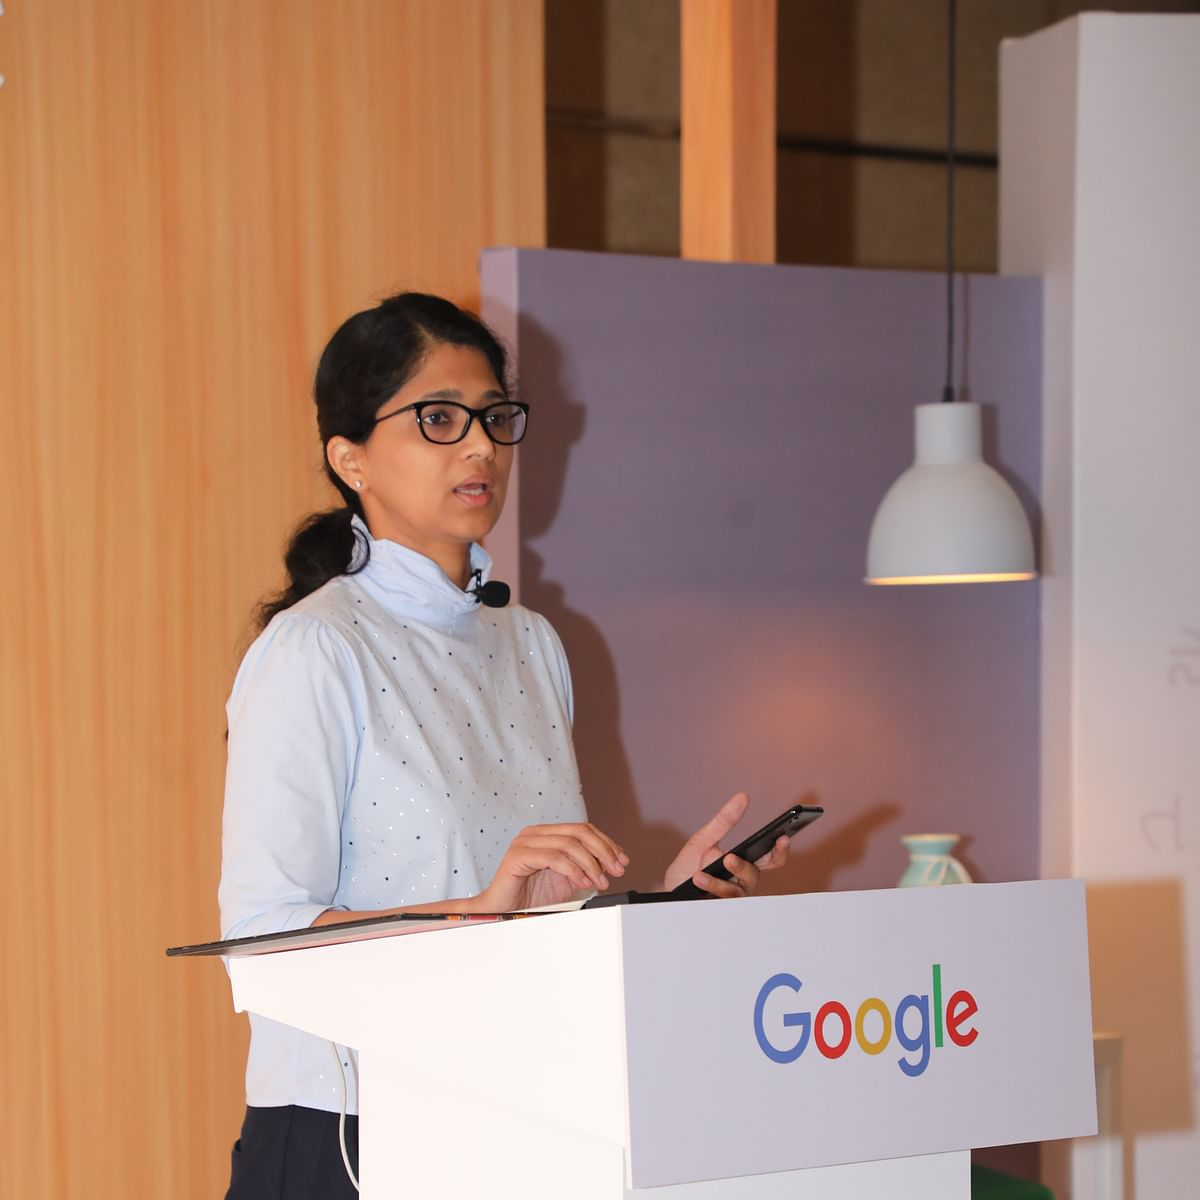 Hindi web consumption grows at over 90%, so does Google services